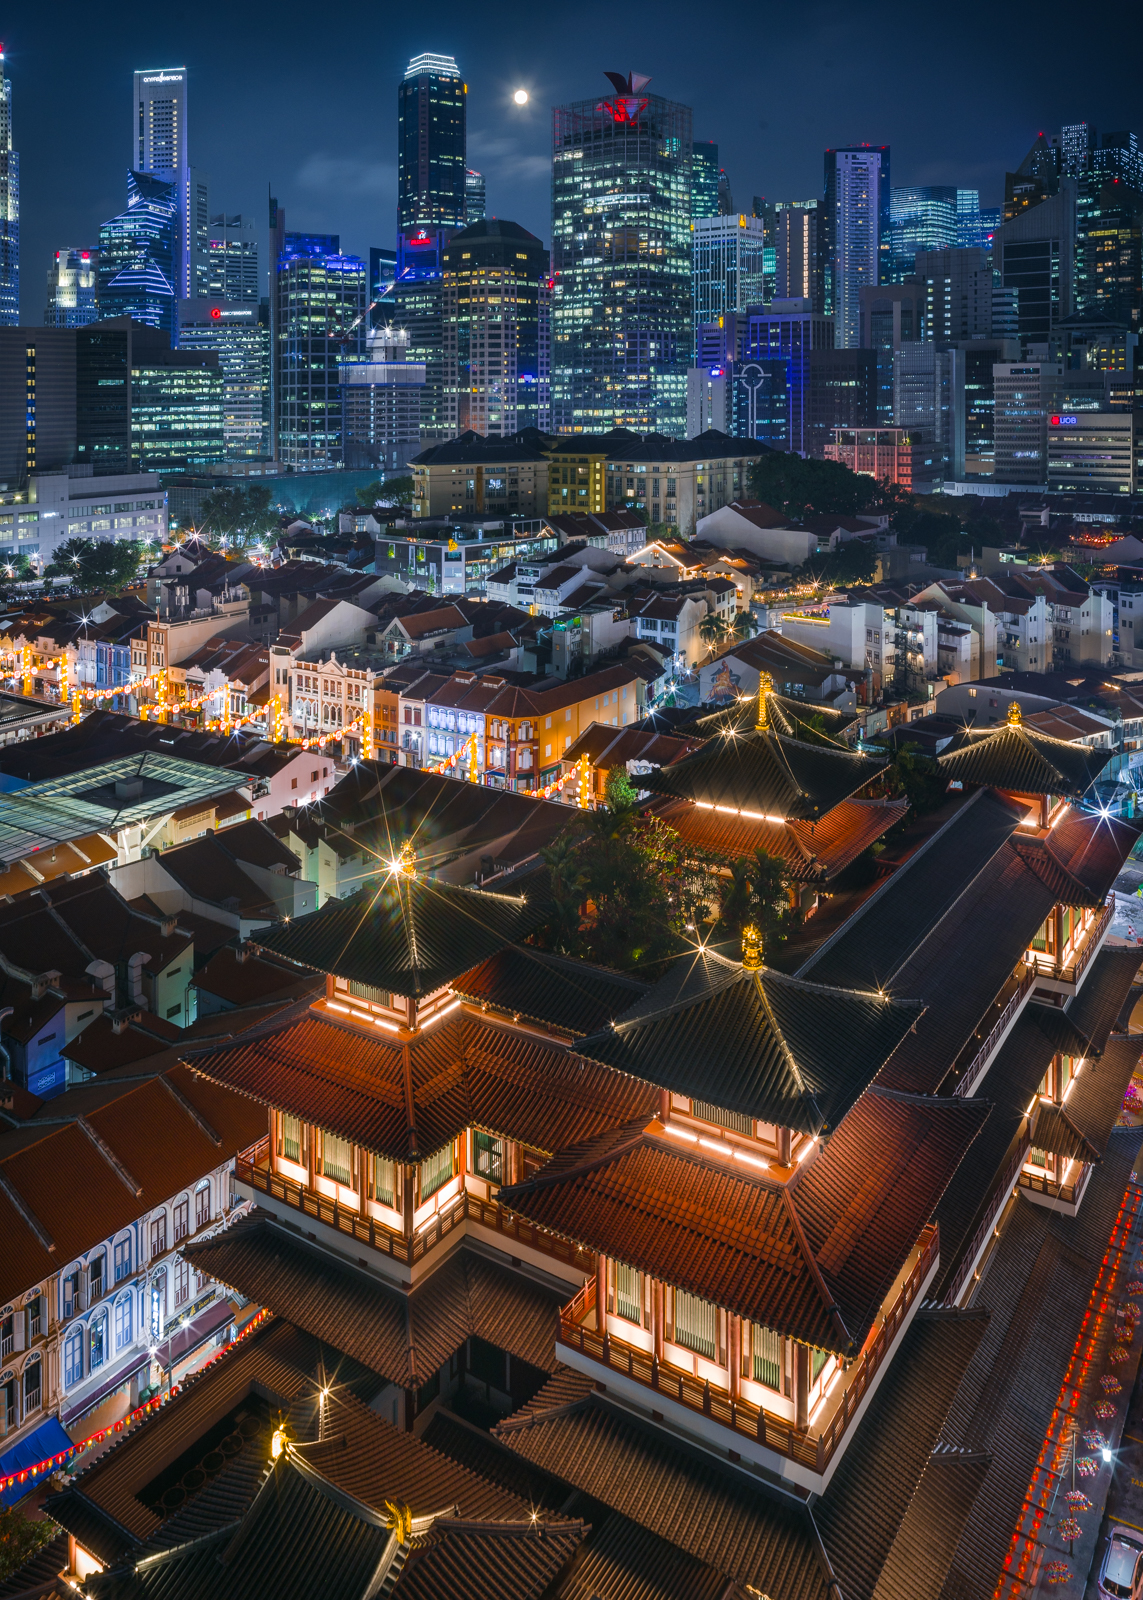 20180302-2018-03-02 Singapore Temple-232 copy.jpg